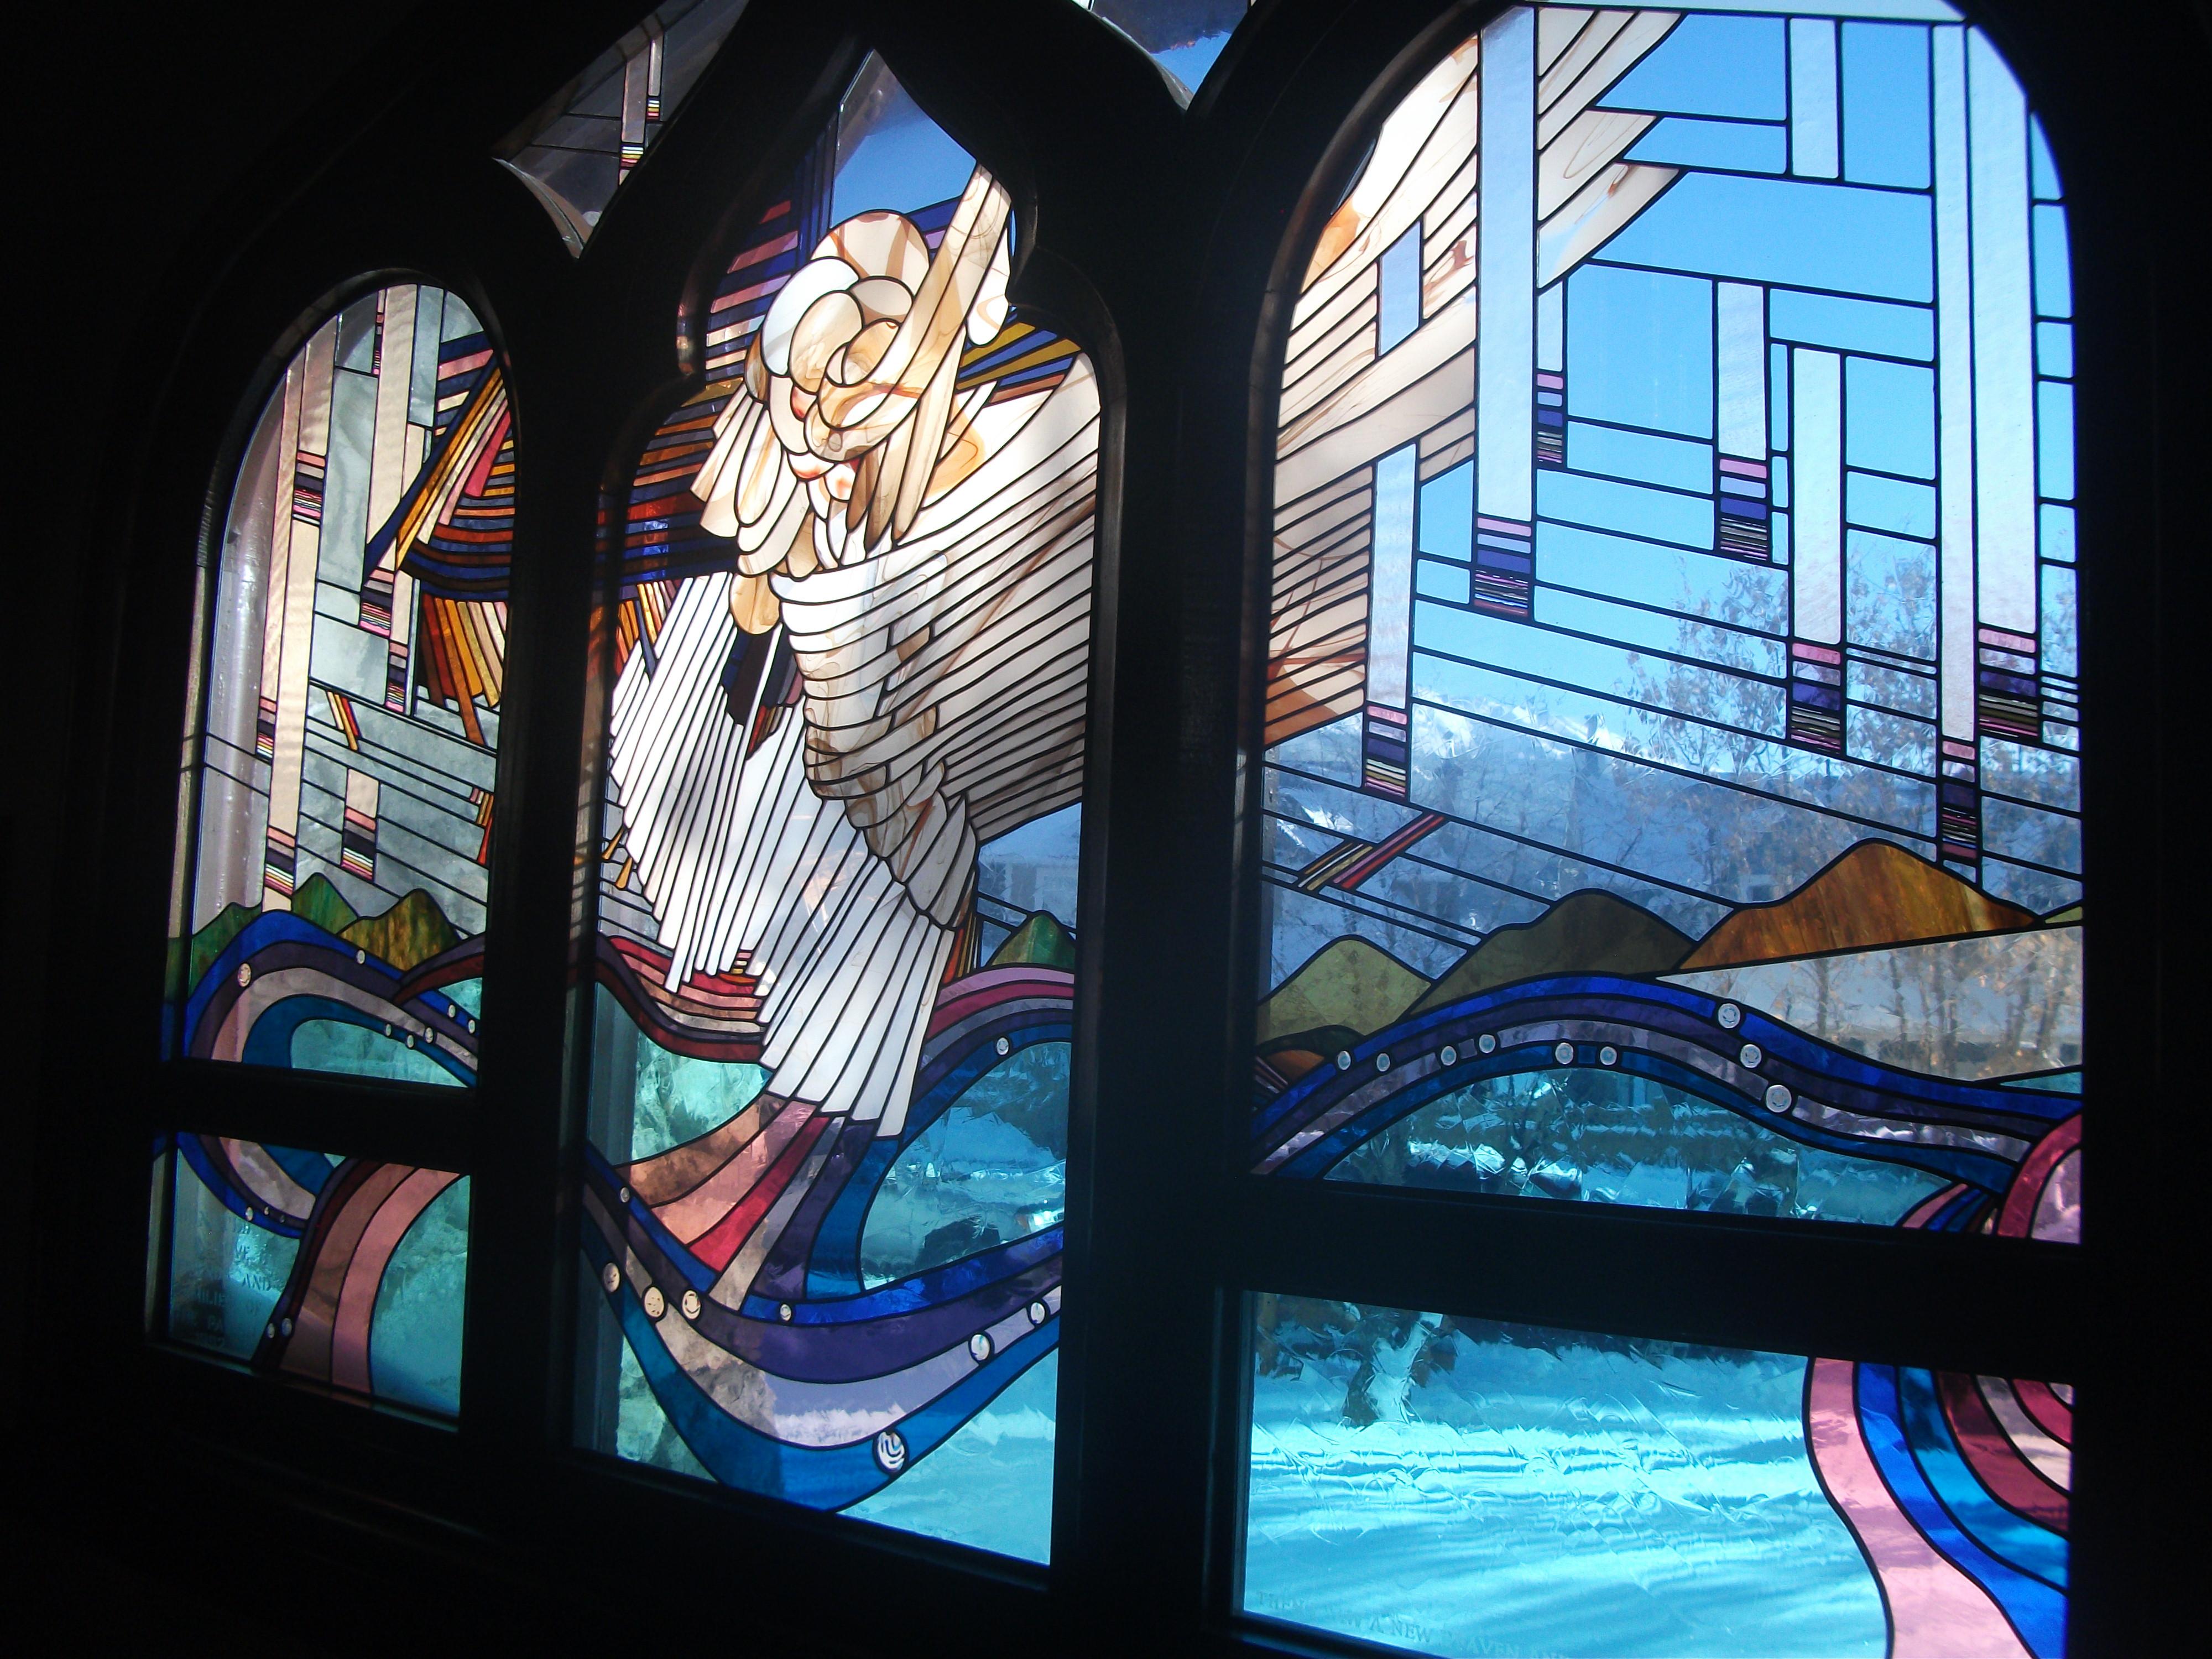 New Heaven Window